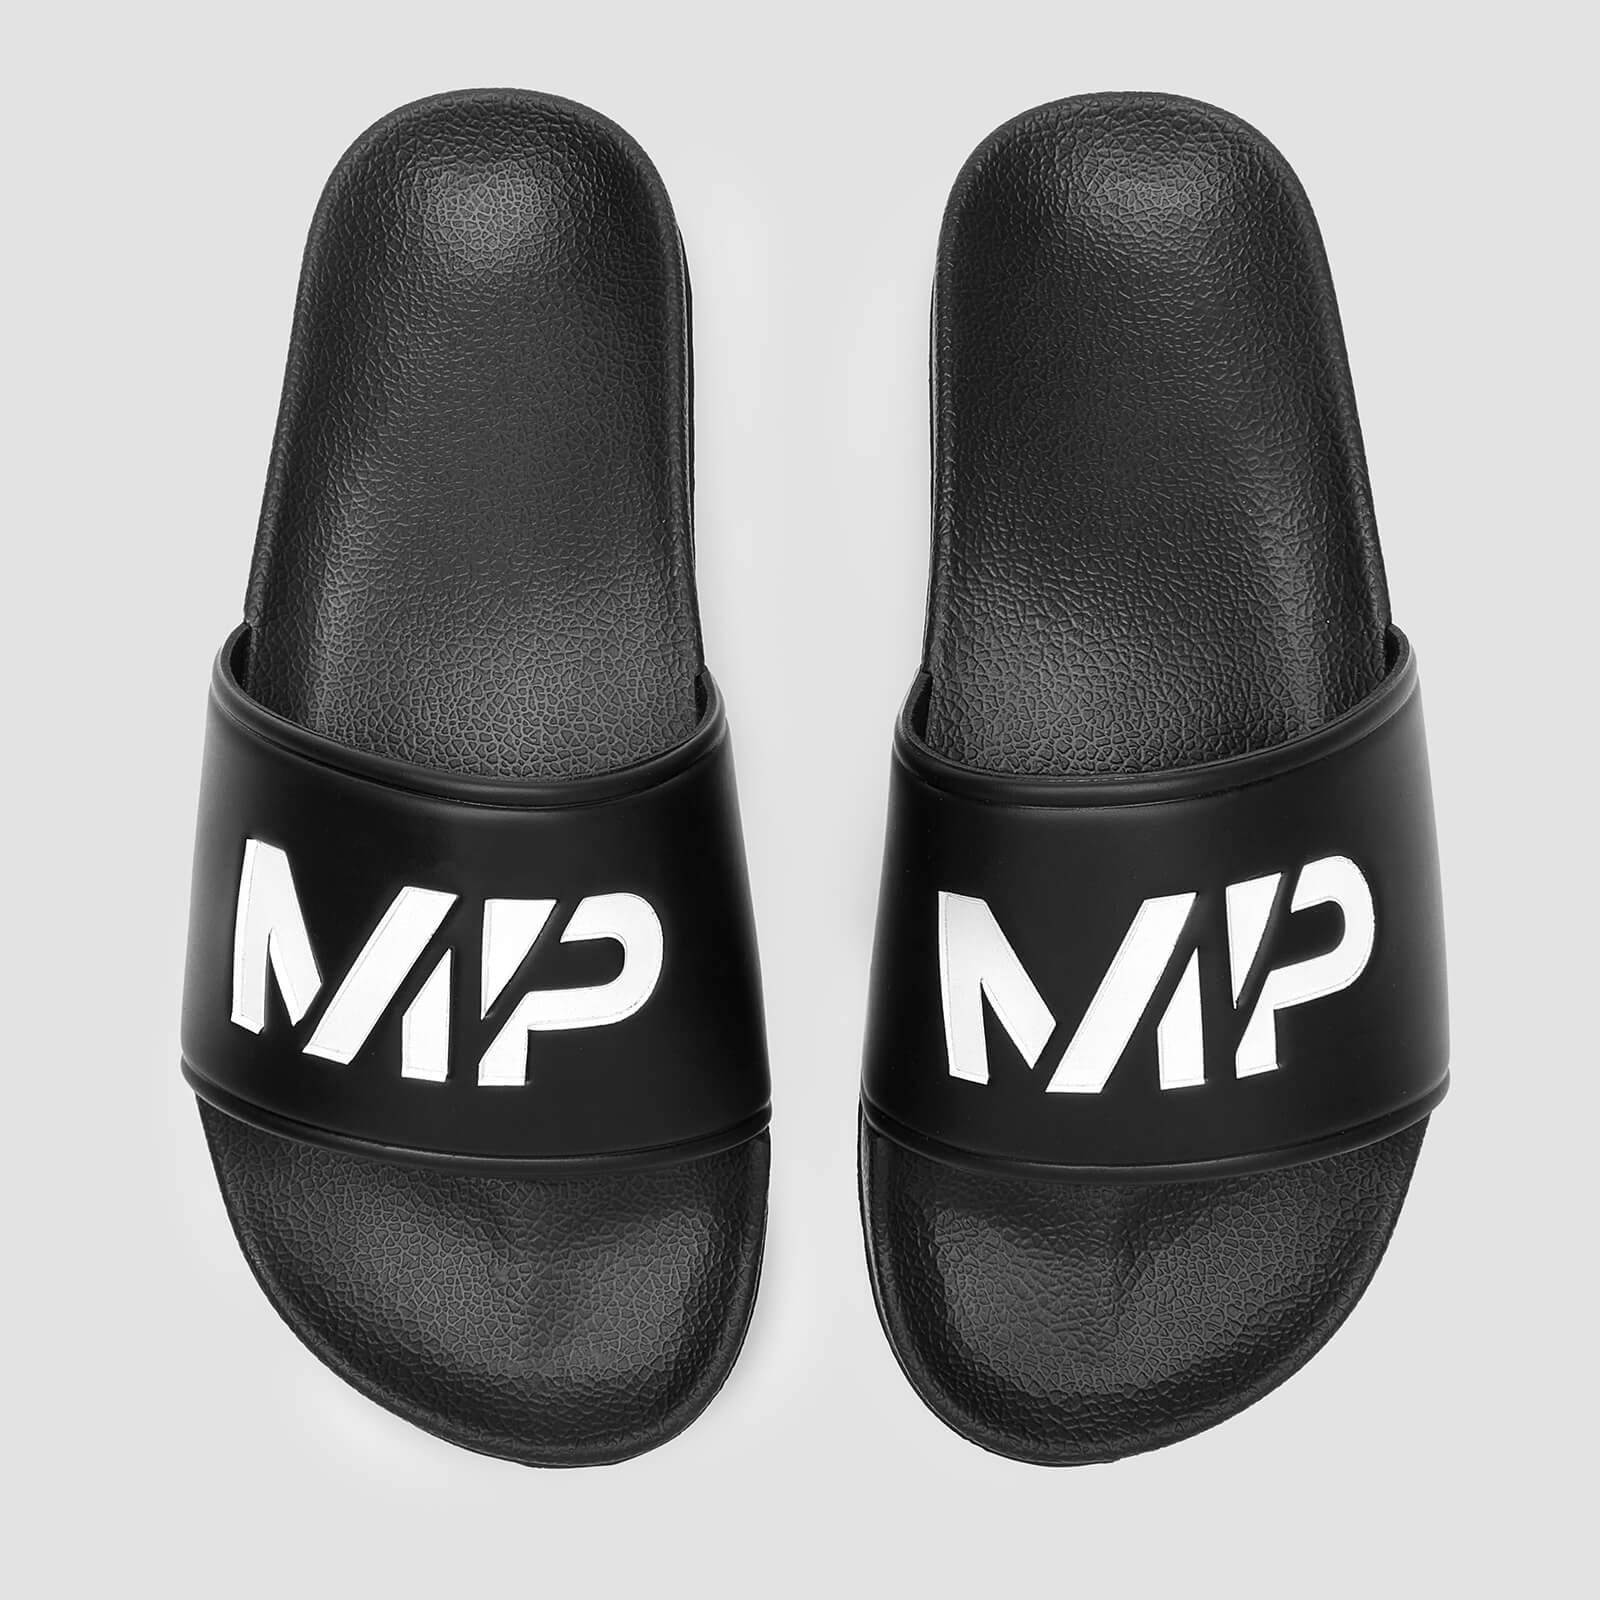 Купить MP Men's Sliders - Black/White - UK 6, Myprotein International